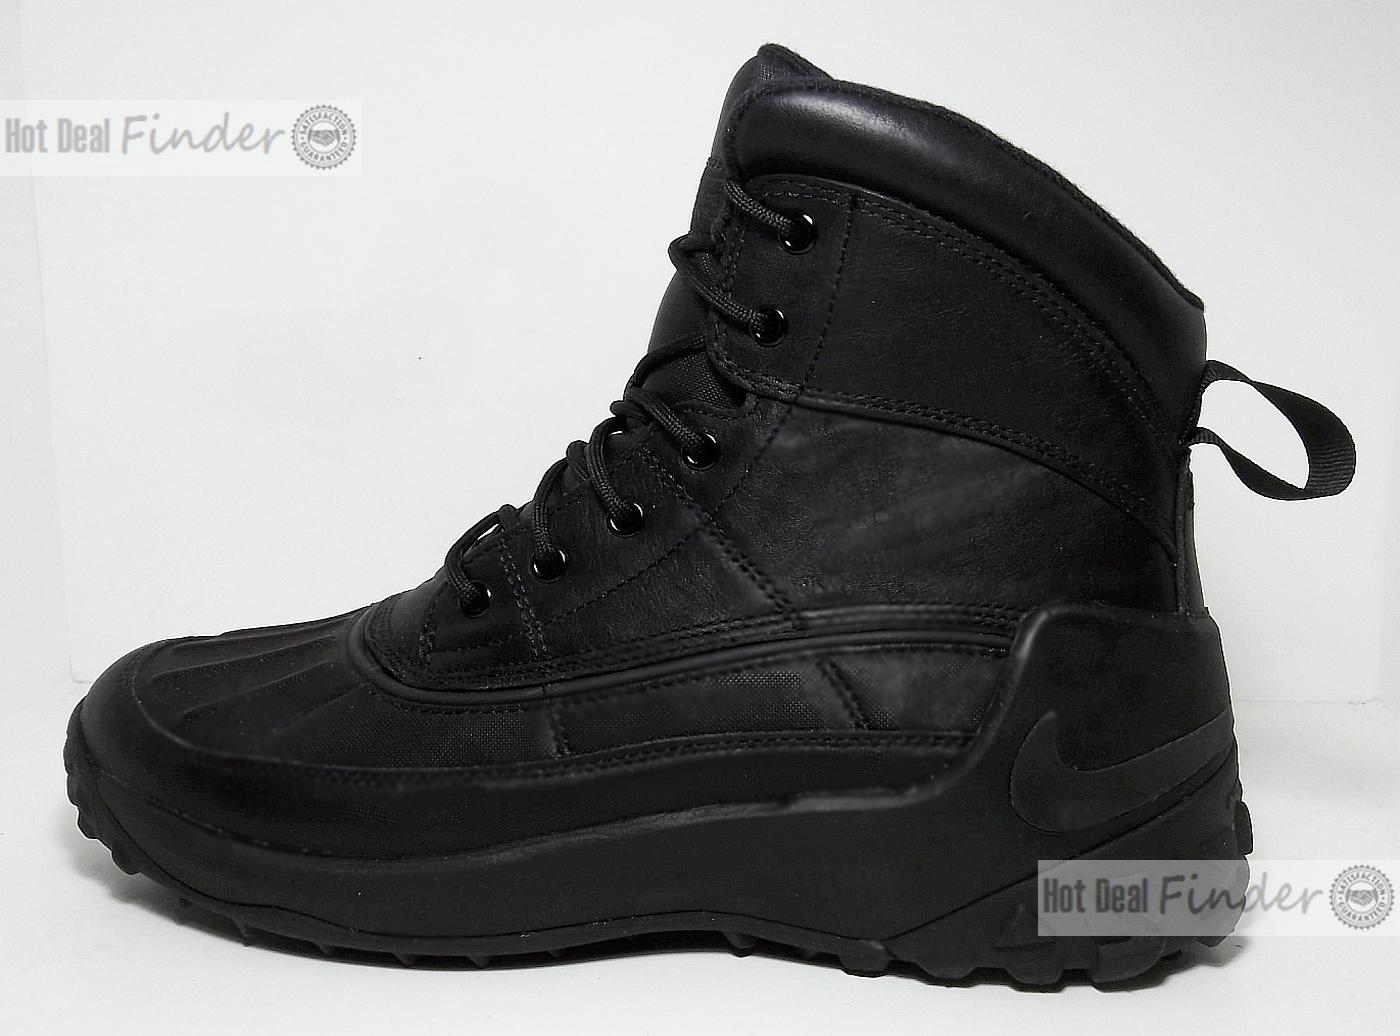 63ac76b4970 Nike Kynwood Mens Winter BOOTS Black Size 8.5 862504-001